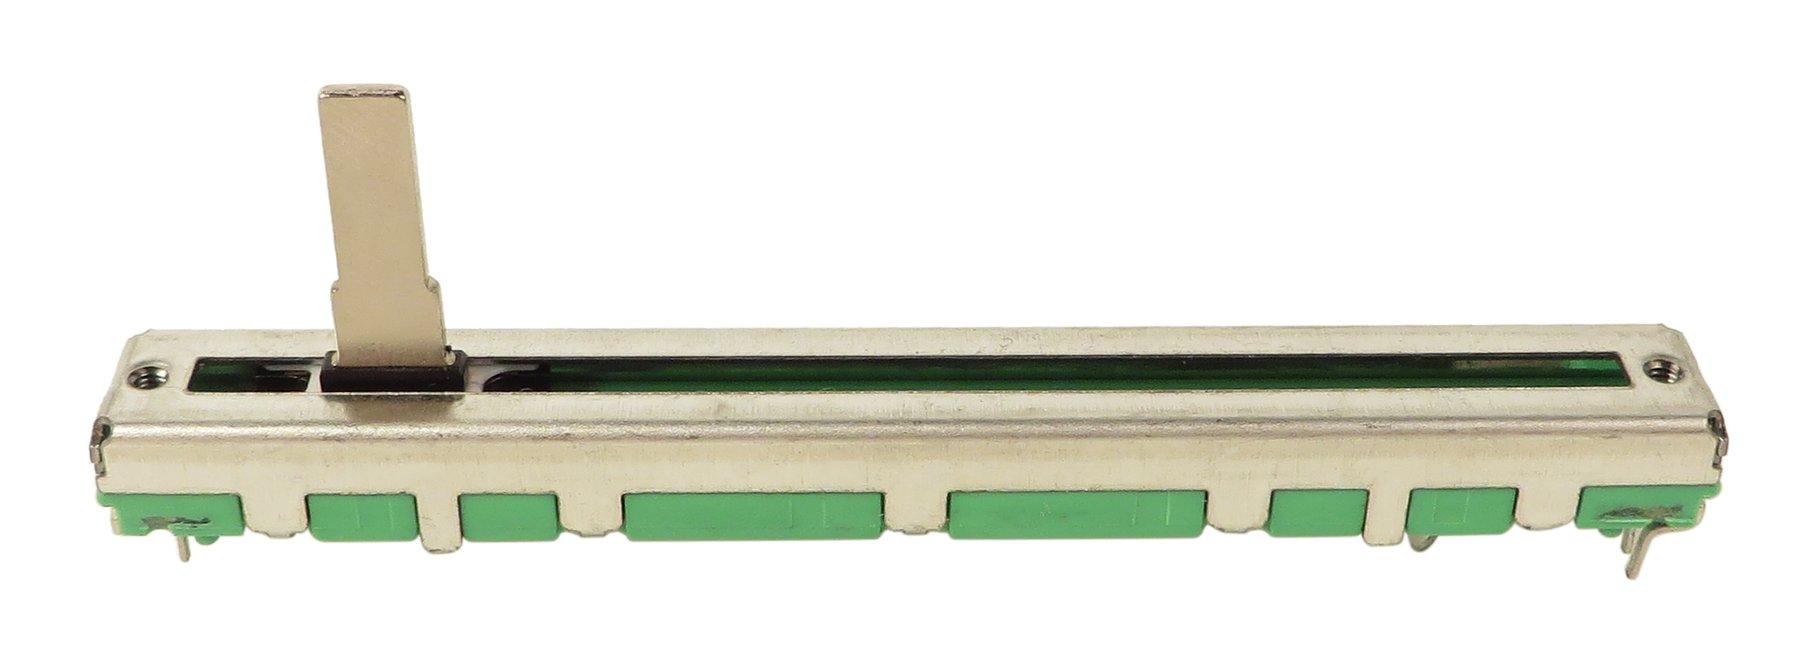 Stereo Fader for MX2004A, SX2442, XENXY X1222USB